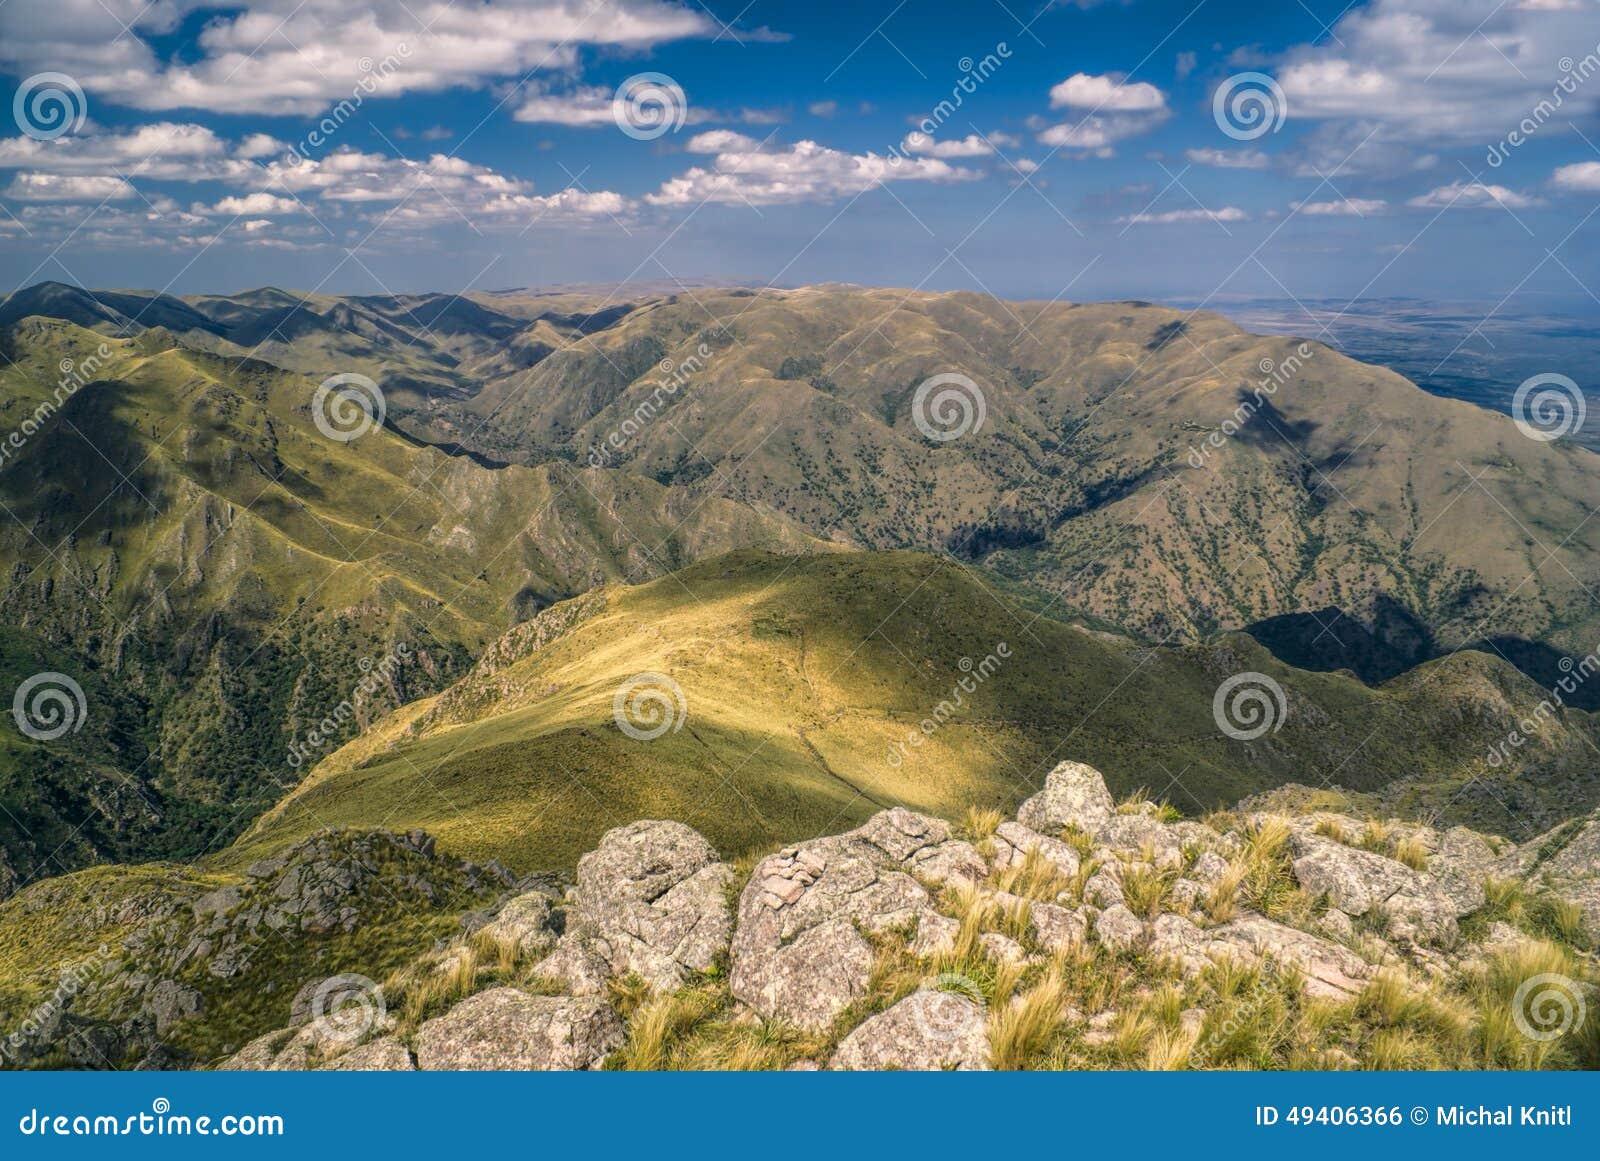 Download Panorama In Capilla Del Monte Stockfoto - Bild von panorama, berge: 49406366